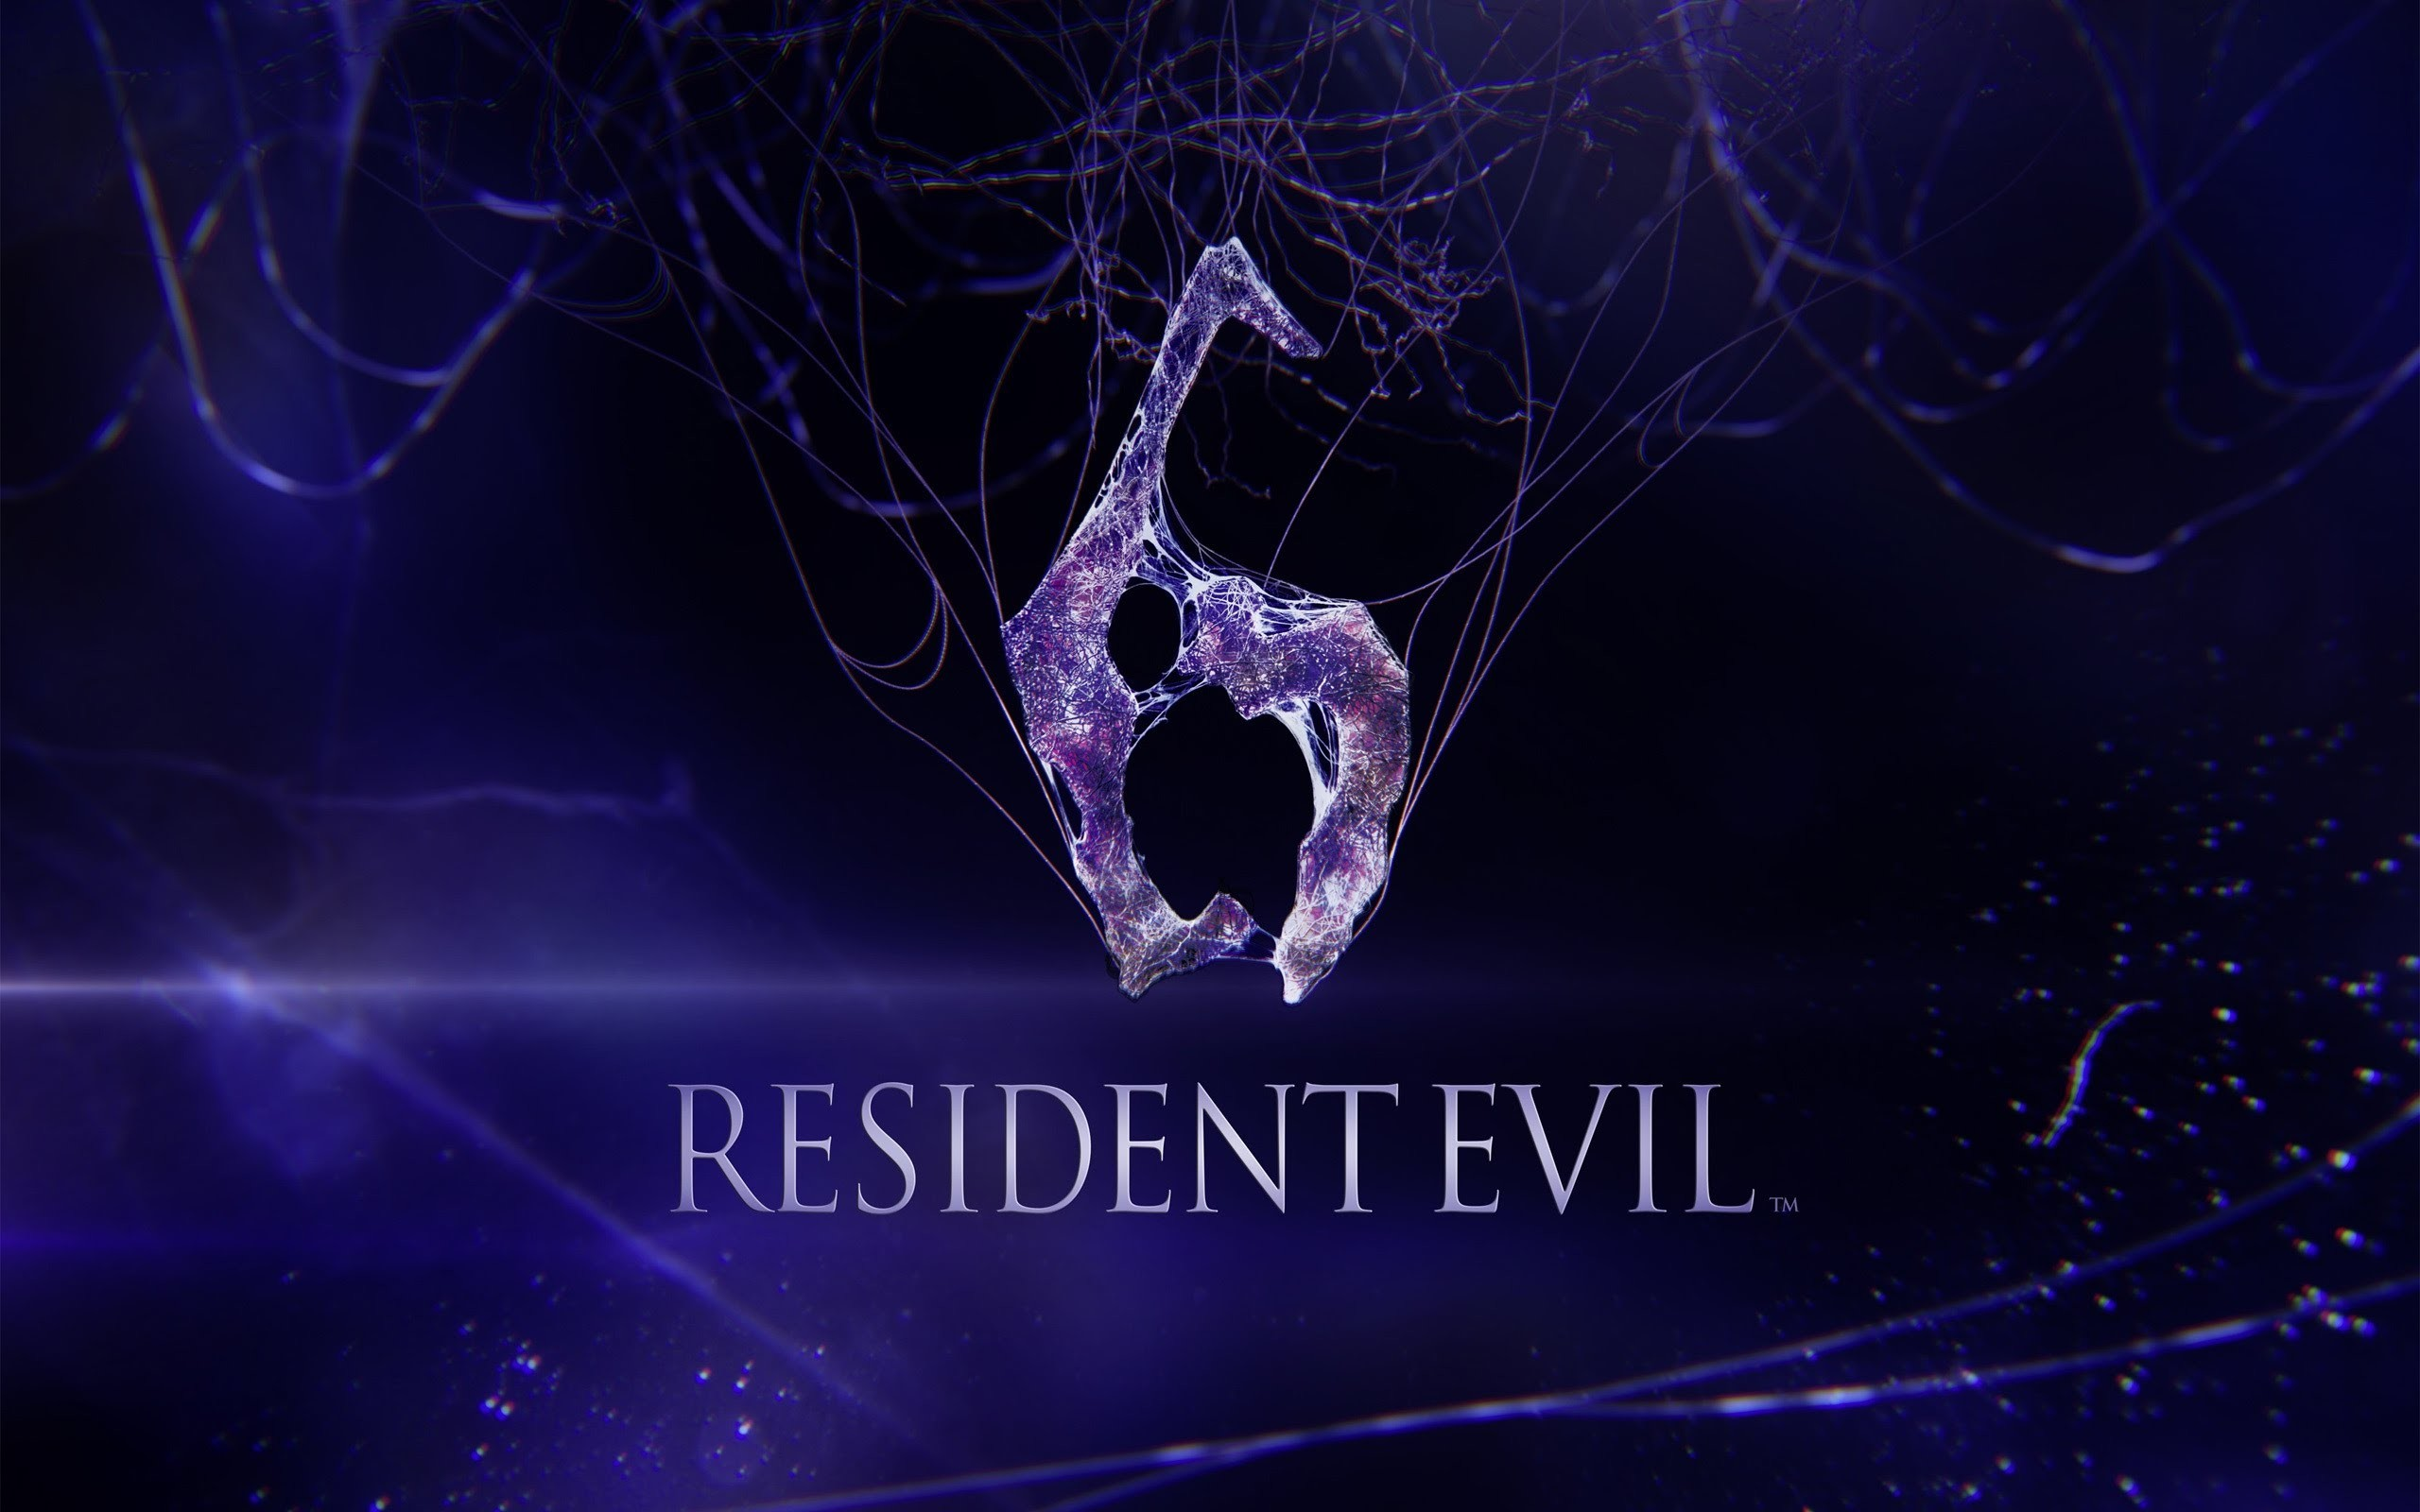 RESIDENT EVIL 6 PC РMenu Espa̱ol РMax 1080p Р02